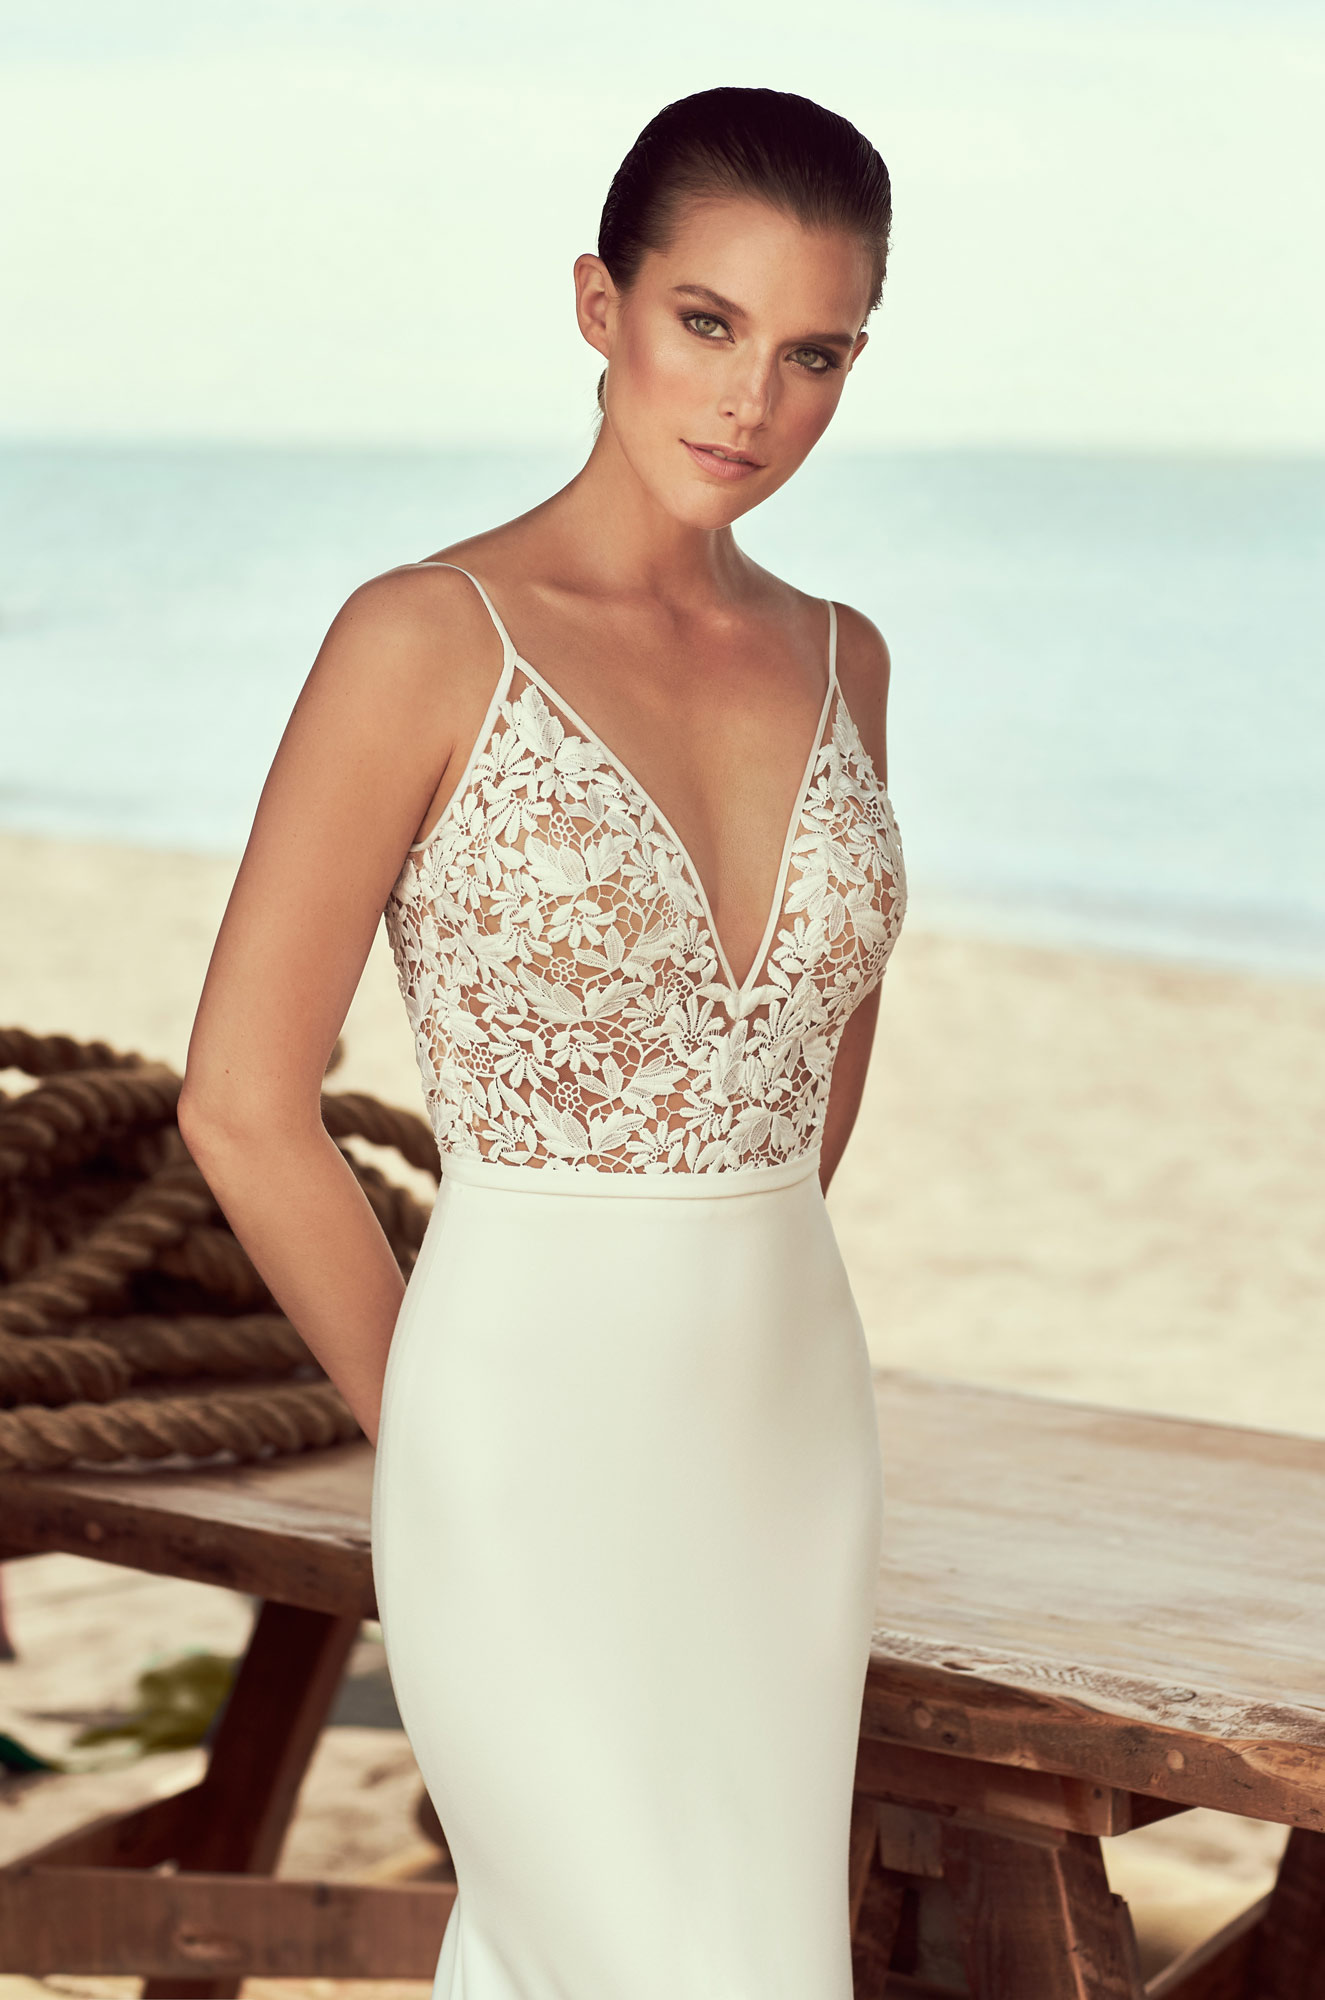 Mira Couture Mikaella 2190 Wedding Dress Bridal Gown Chicago Boutique Detail